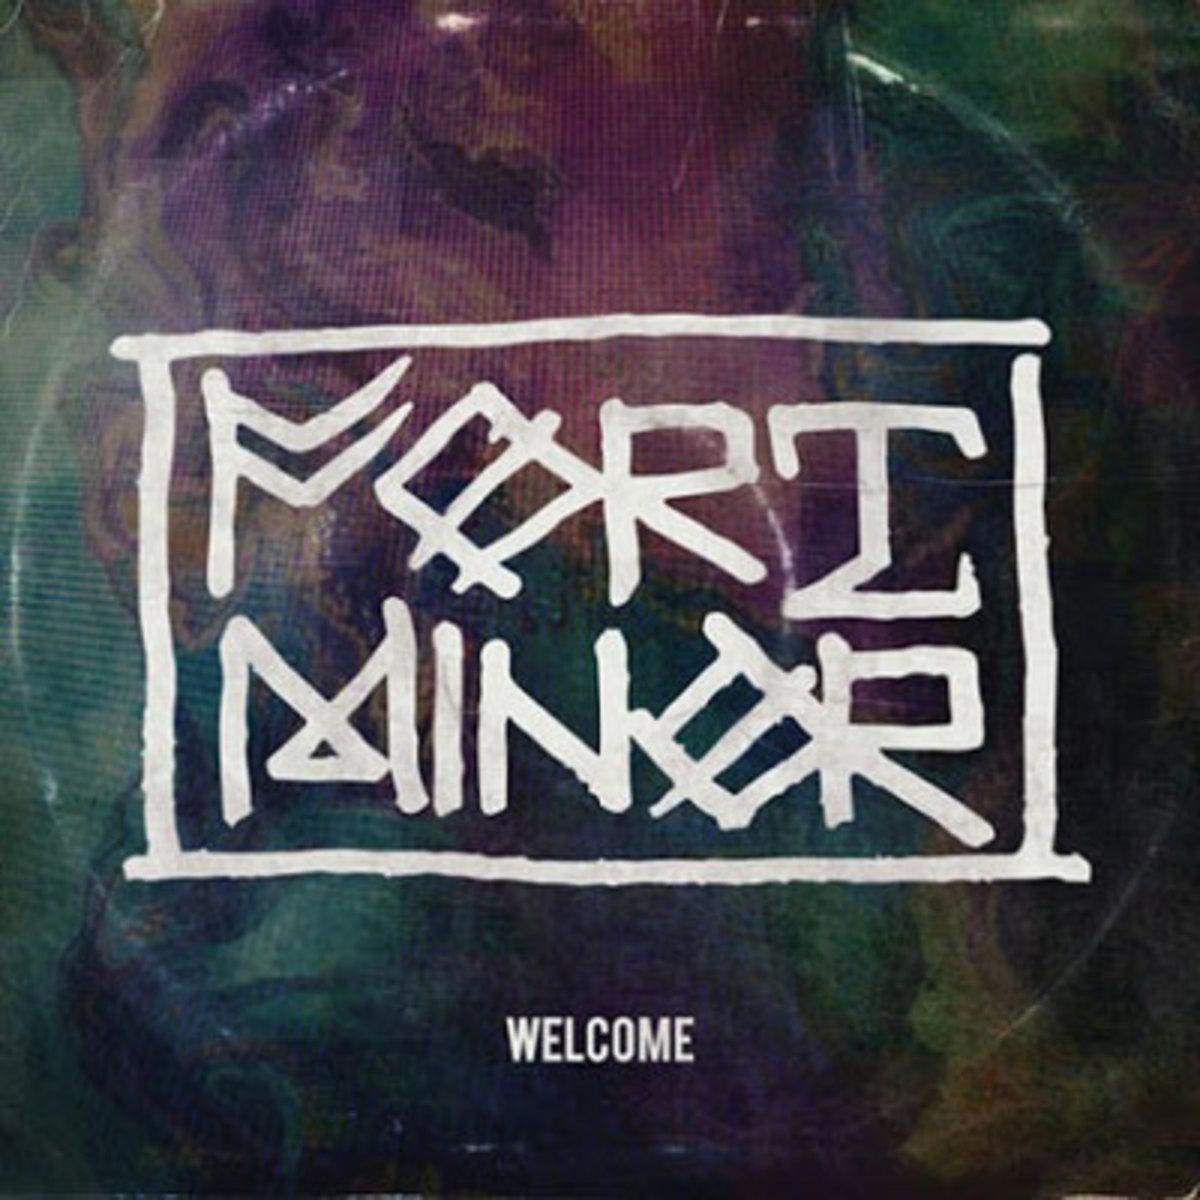 fort-minor-welcome.jpg